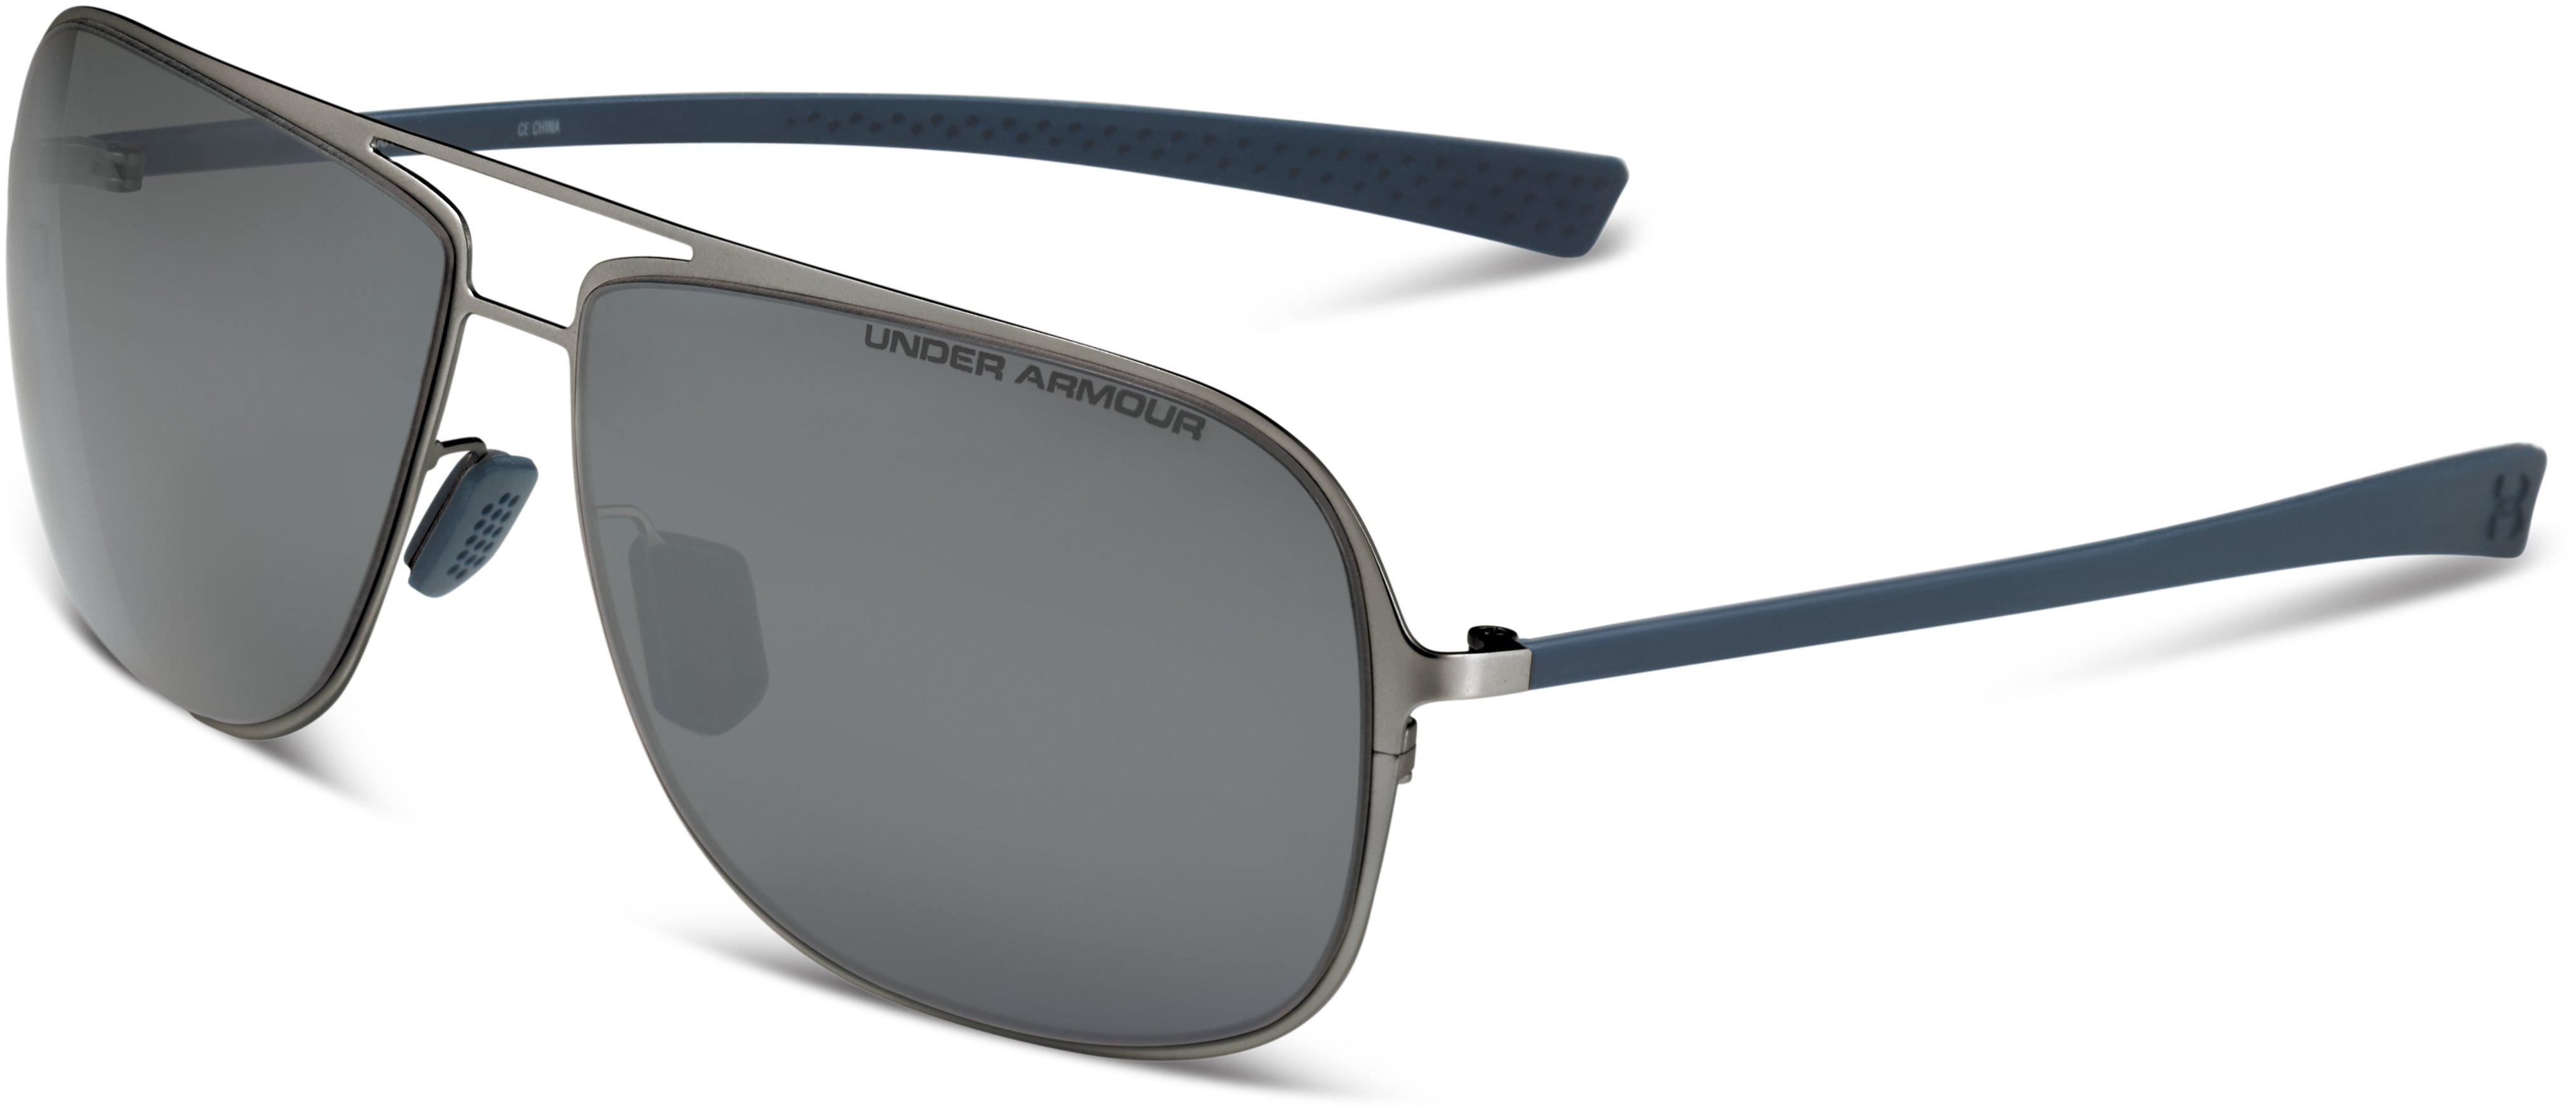 oakley military sunglasses rc9s  oakley twoface prescription sunglasses; ua alloy sunglasses, satin  silver, zoomed image